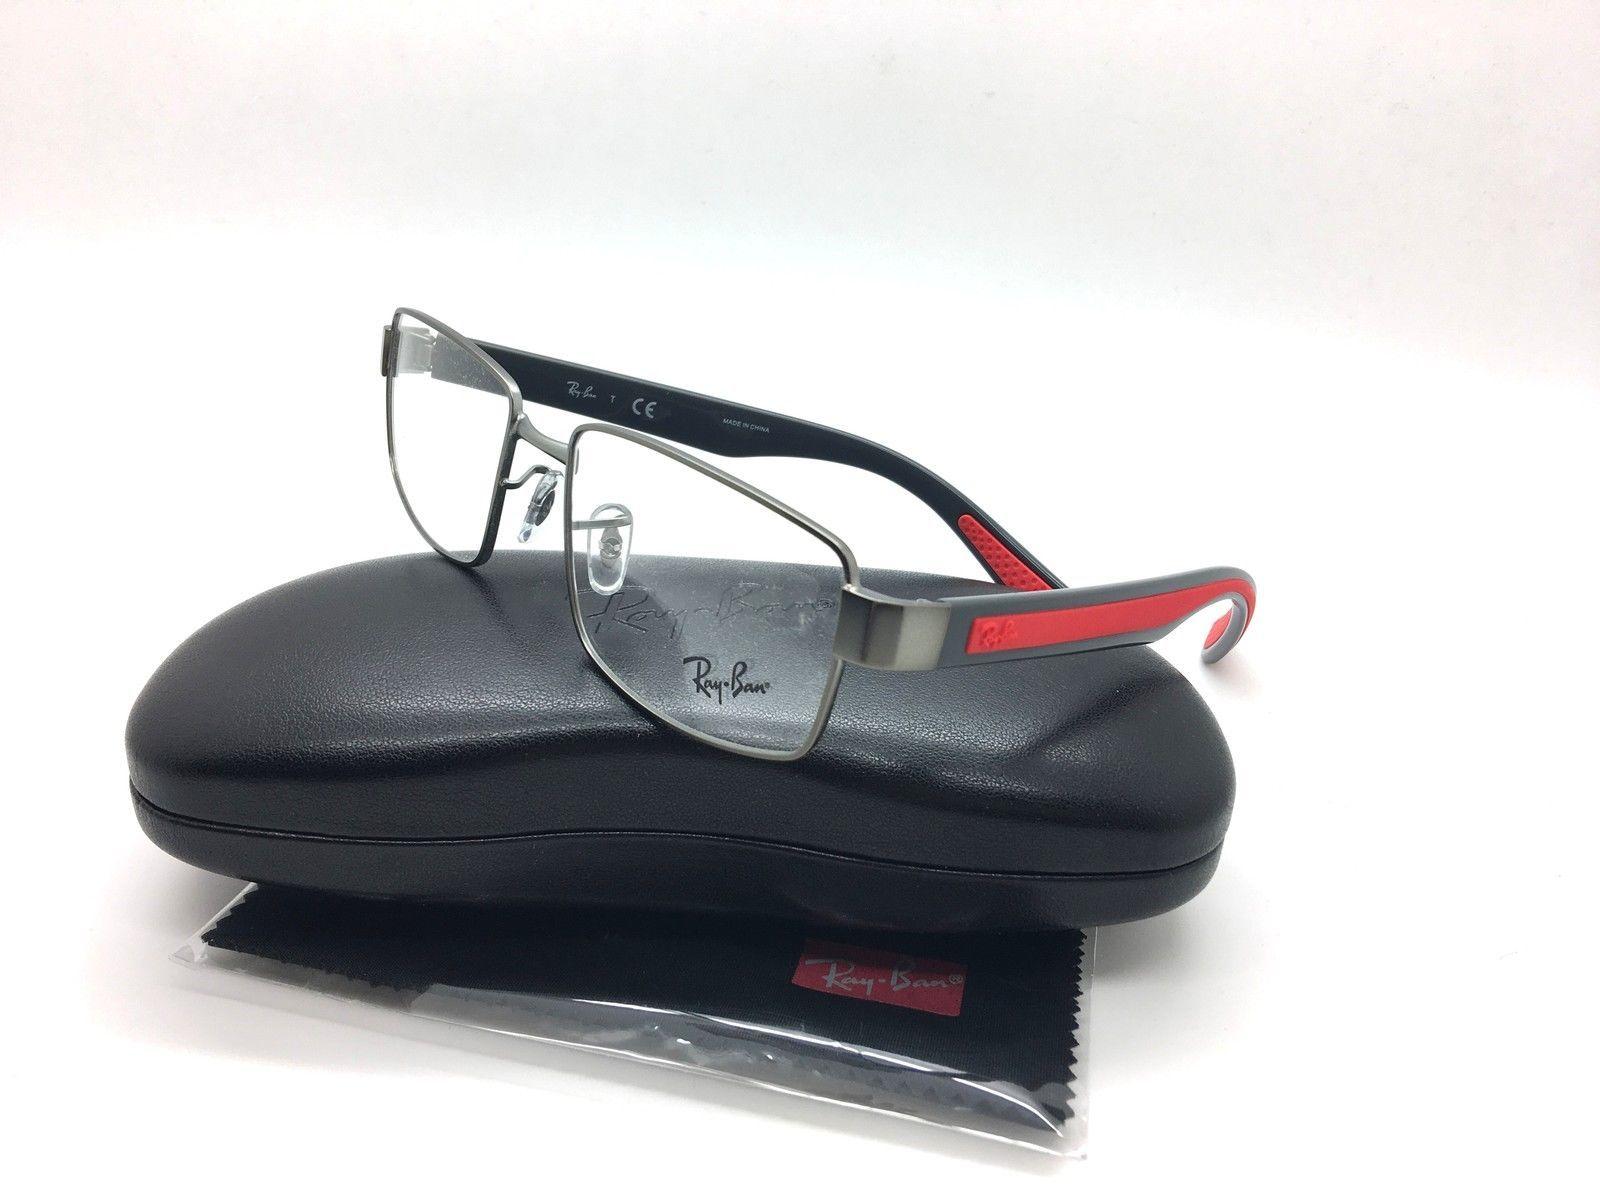 0506c1c7c1 Eyeglass Frames  Ray-Ban Rb 6319 2837 Gunmetal Grey Red New Authentic  Eyeglasses 55Mm W Case -  BUY IT NOW ONLY   69.97 on eBay!